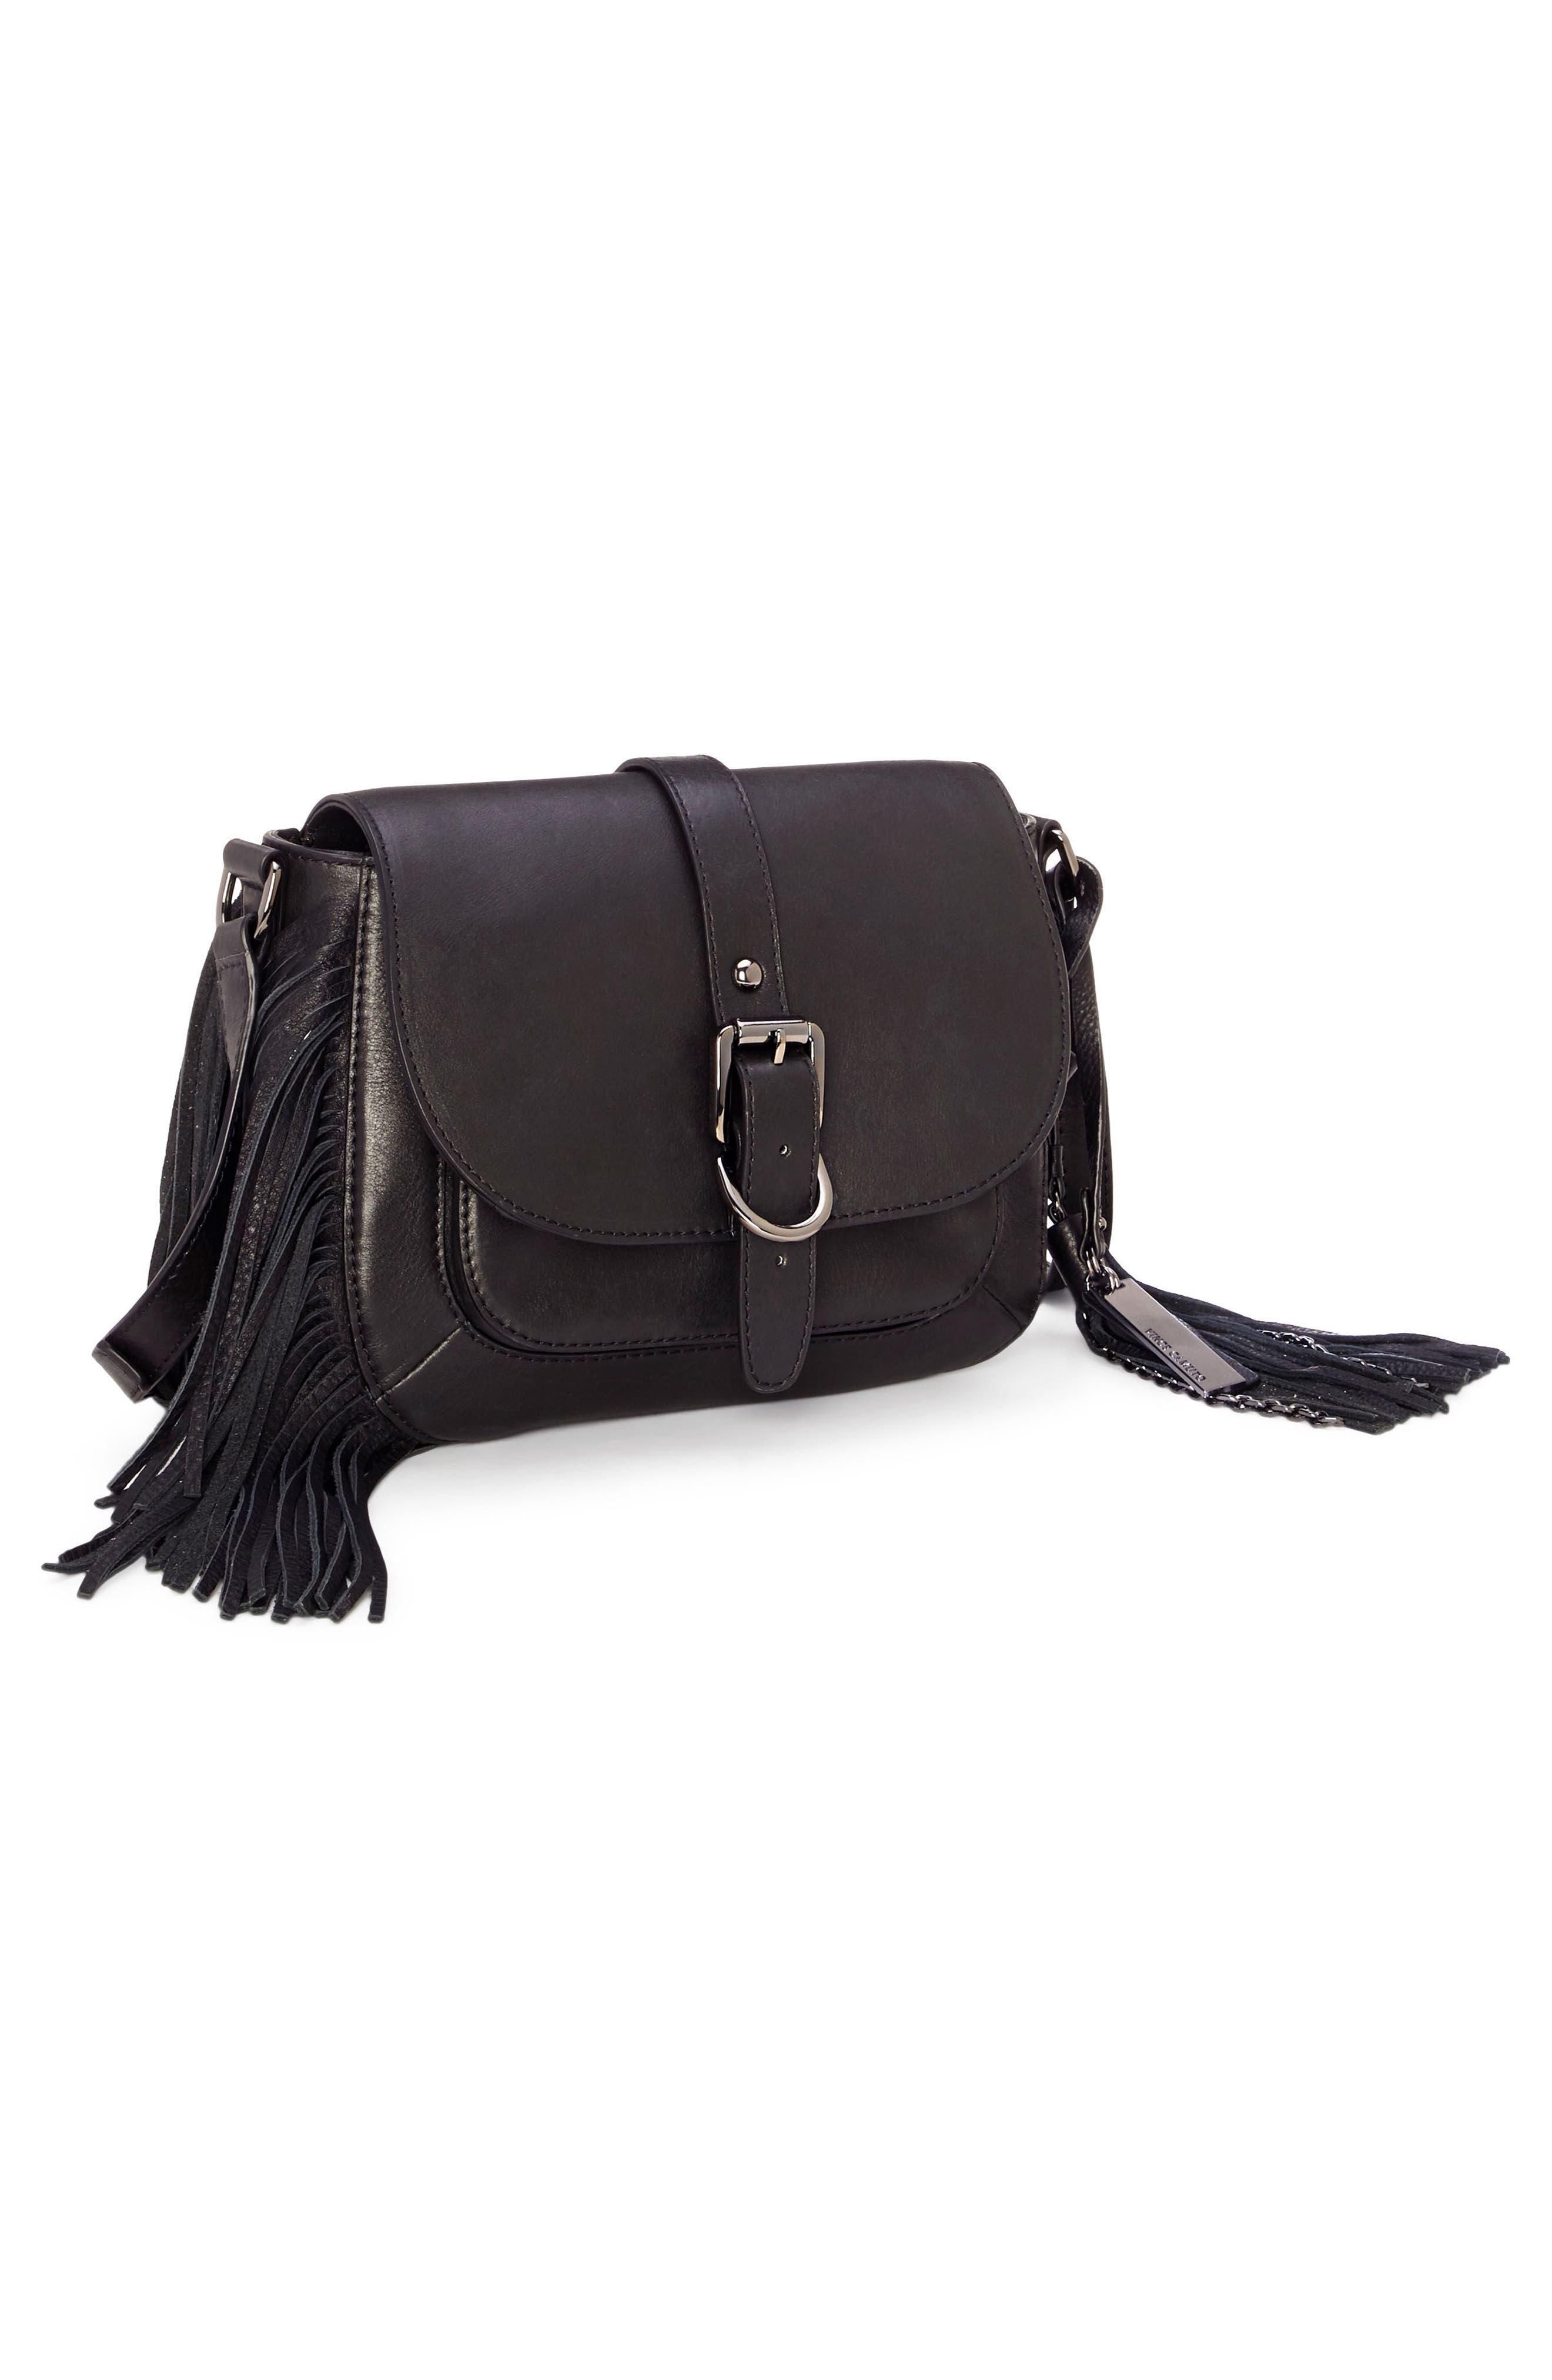 Hil Leather Crossbody Bag,                             Alternate thumbnail 4, color,                             002